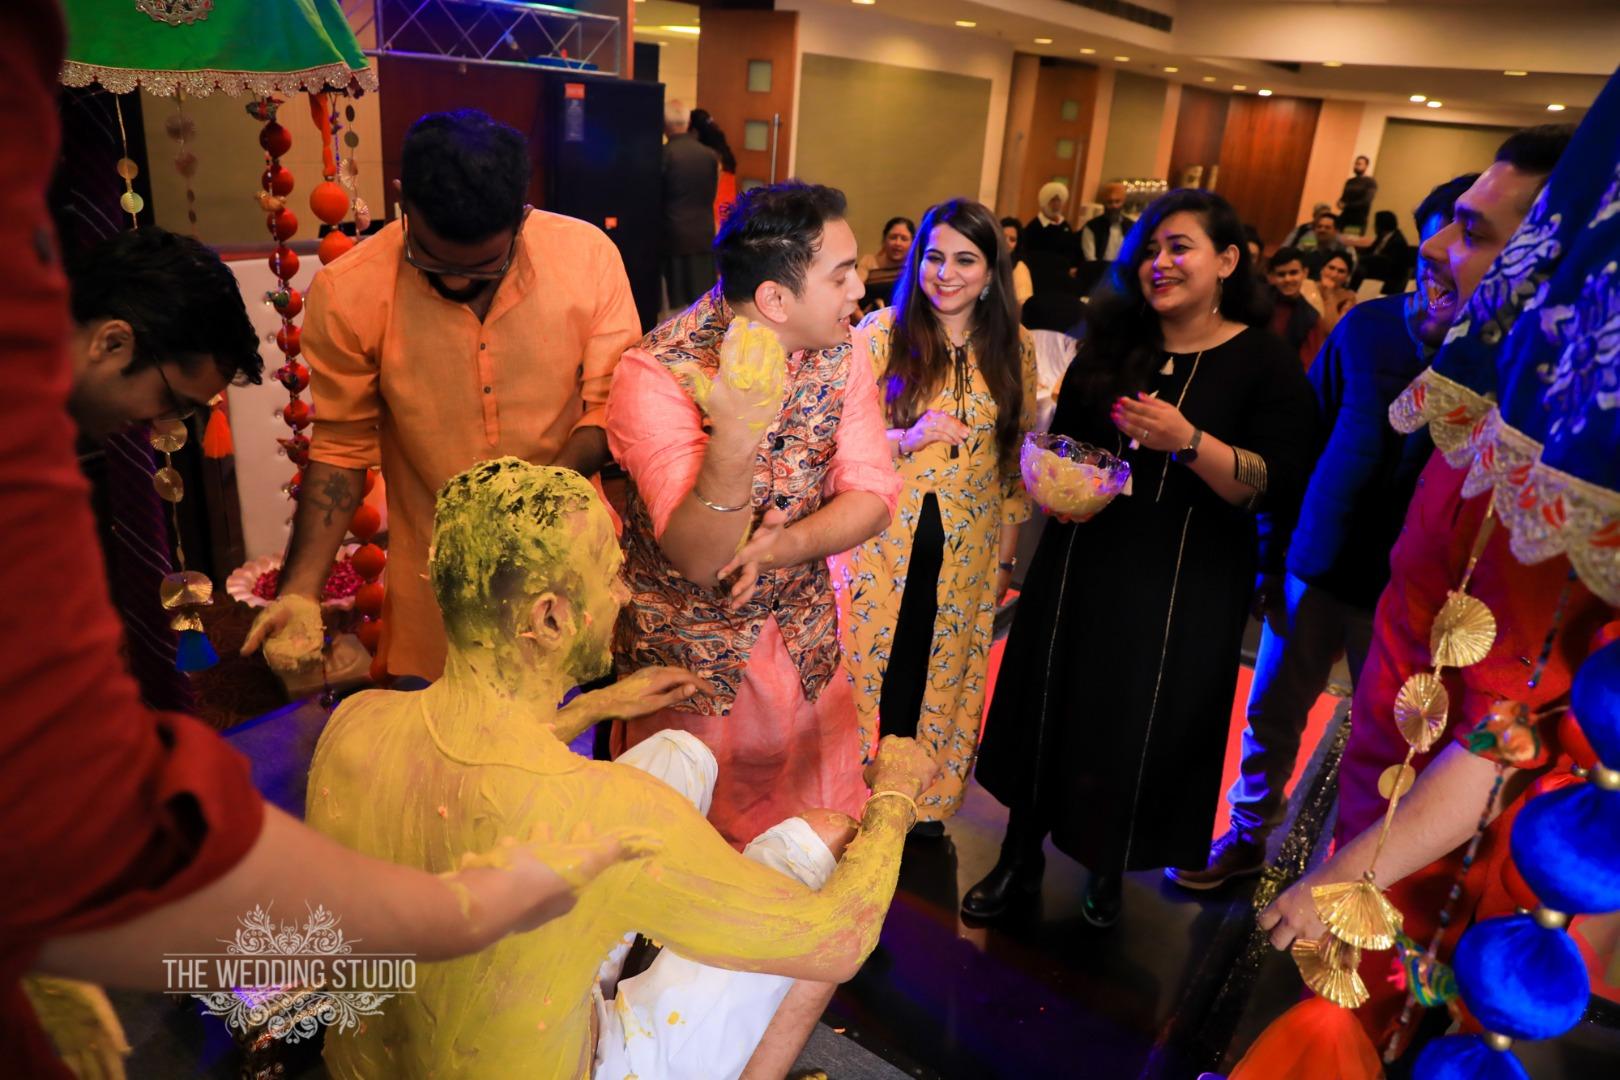 Groom Fun Pictures at Haldi Ceremony